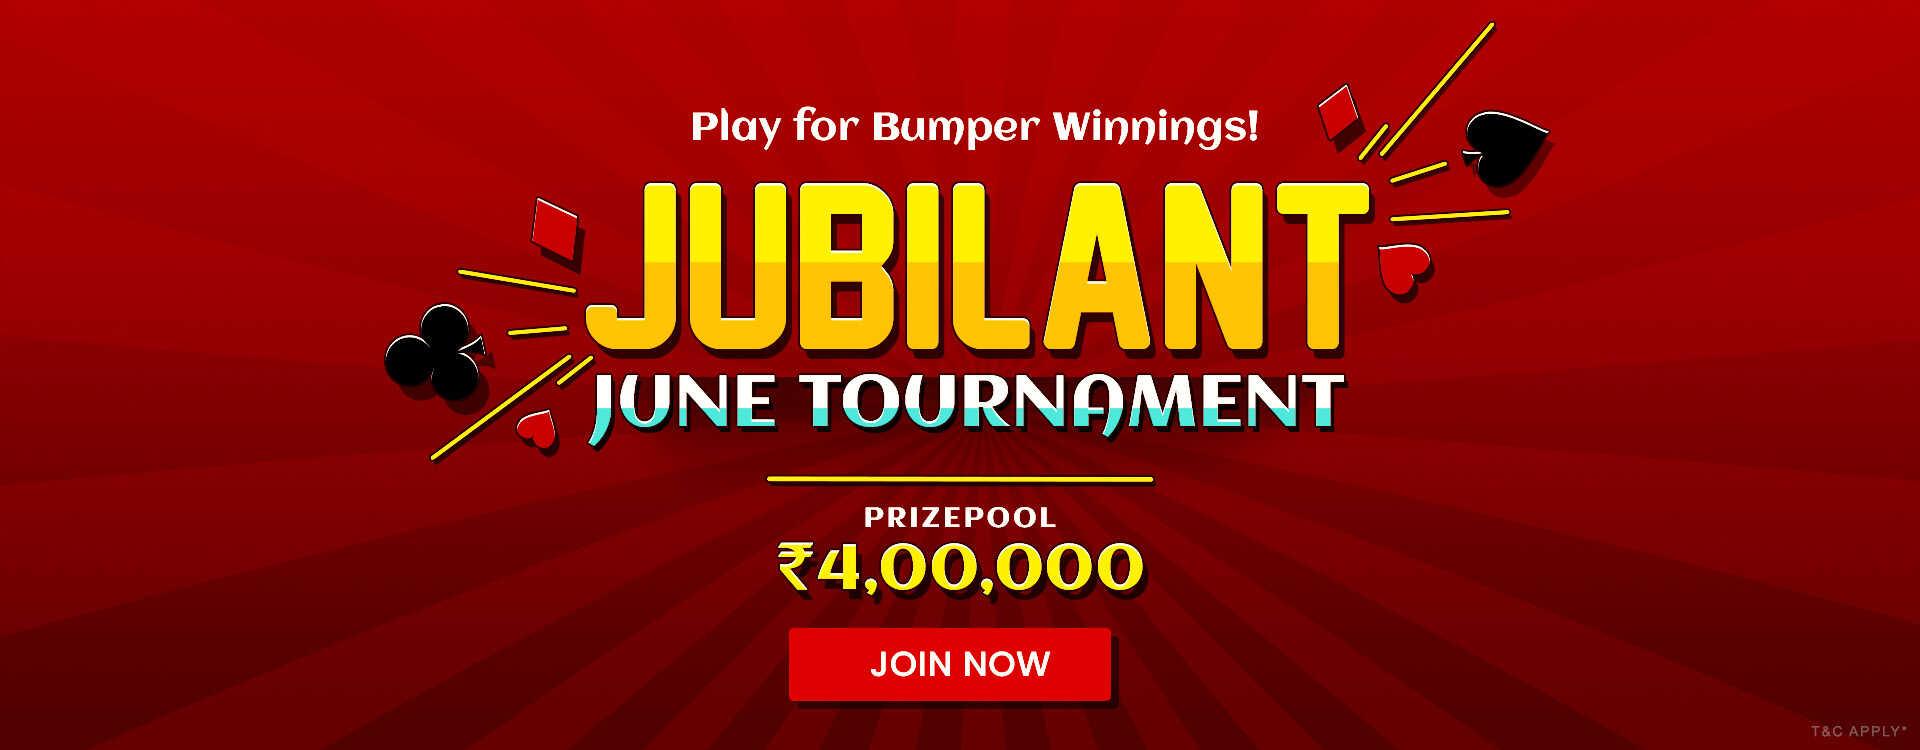 Jubiliant June Tournament